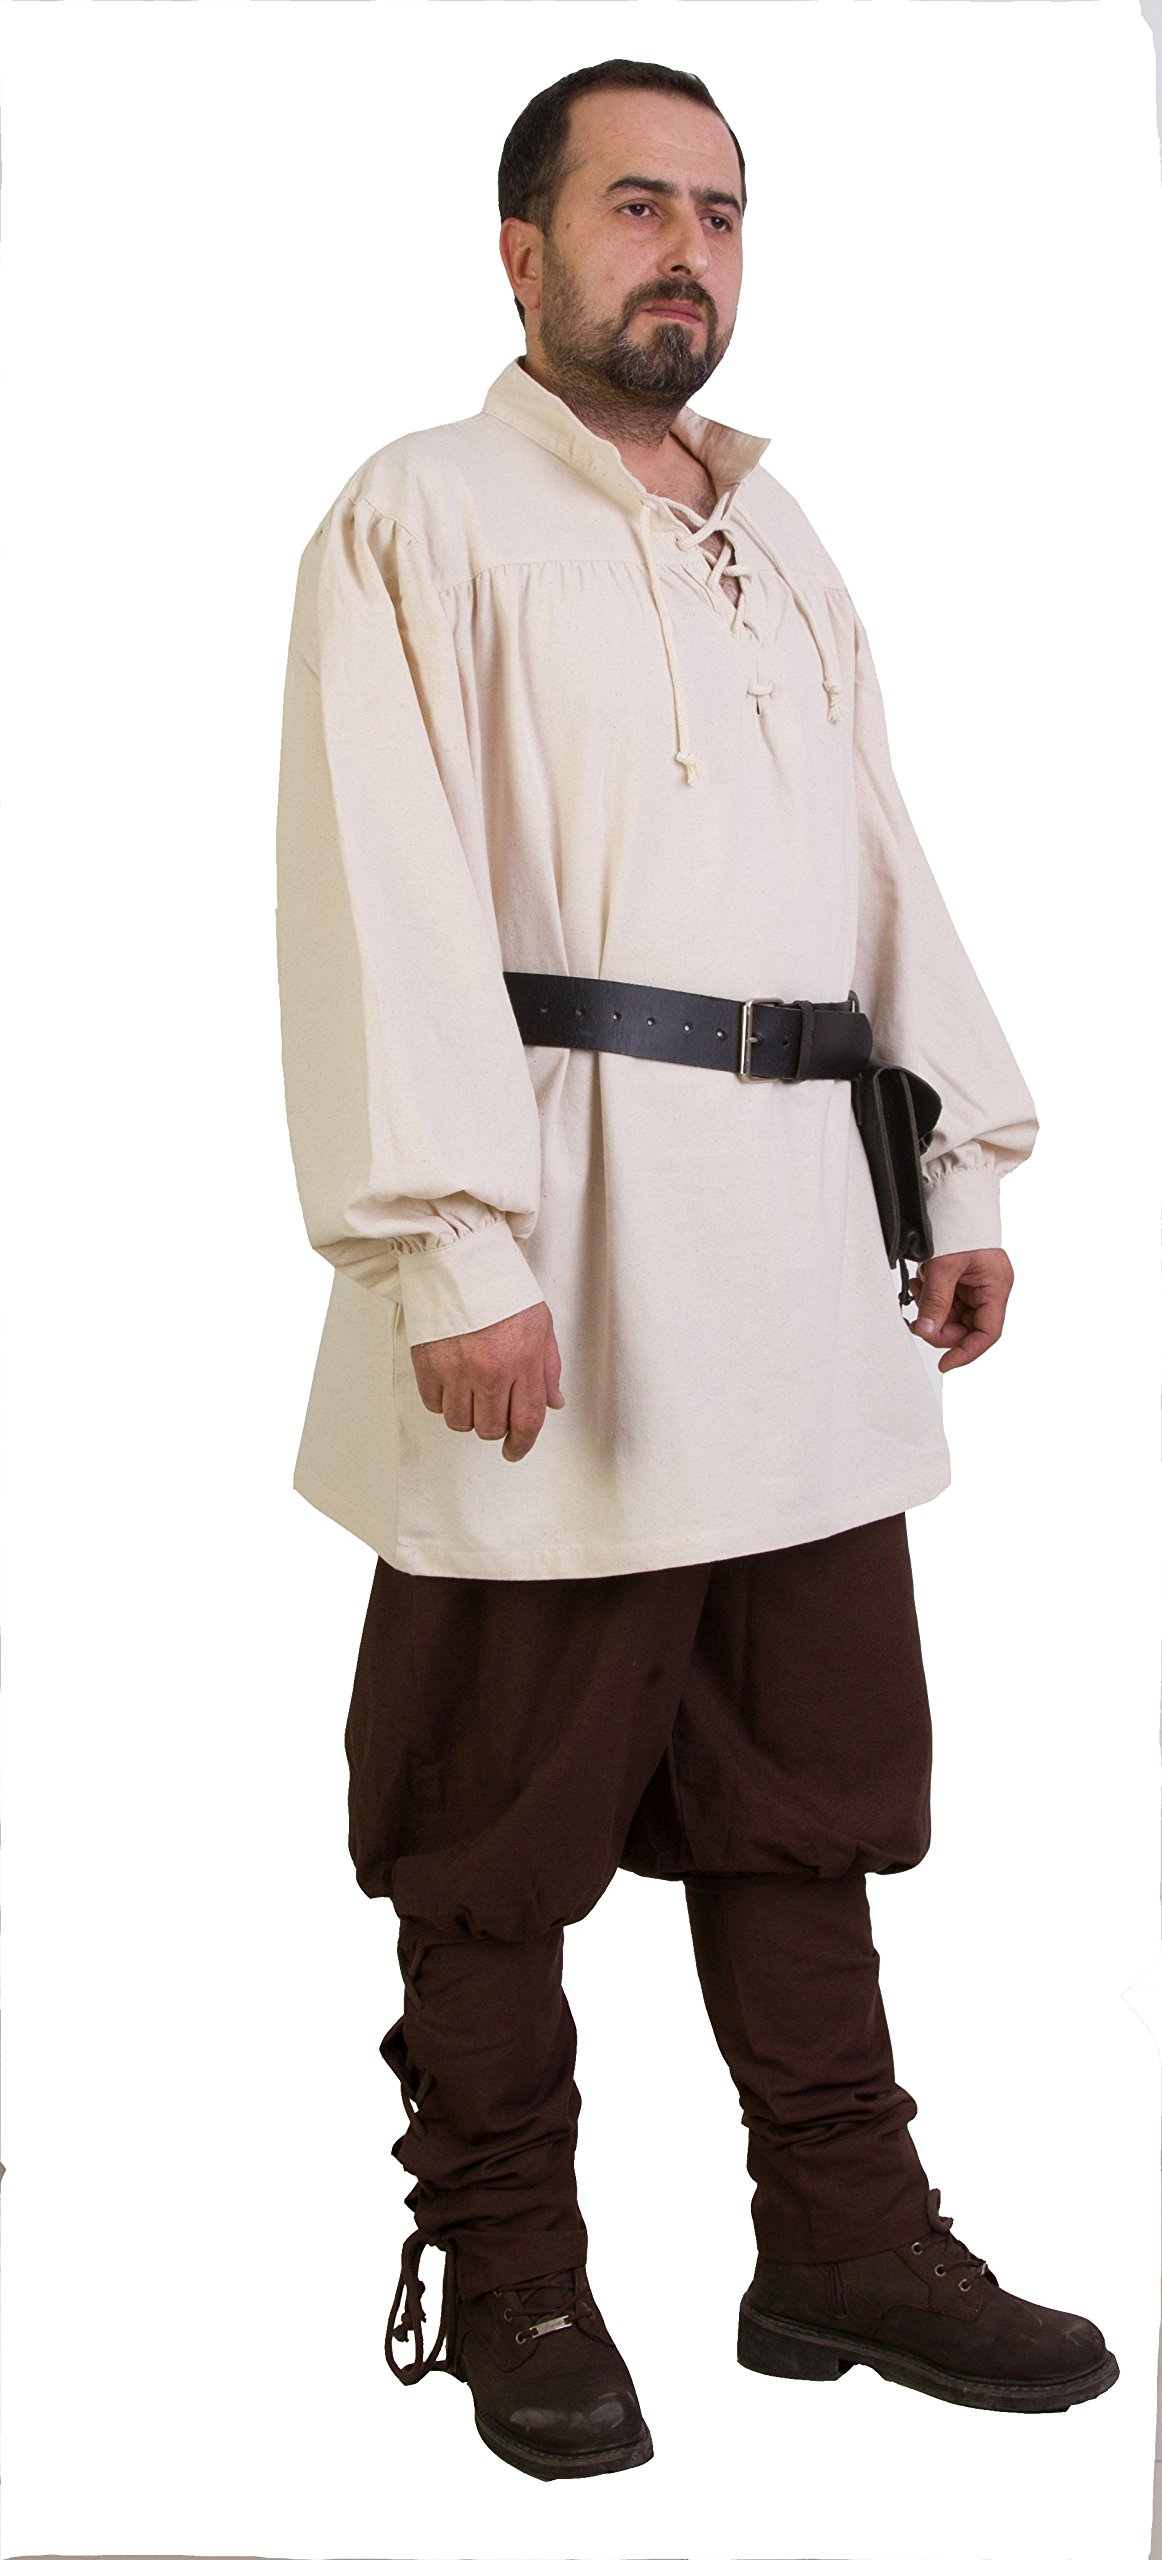 byCalvina - Calvina Costumes ERMES Medieval Viking LARP Pirate Cotton Man Shirt - Made in Turkey-Nat-2XL by byCalvina - Calvina Costumes (Image #5)